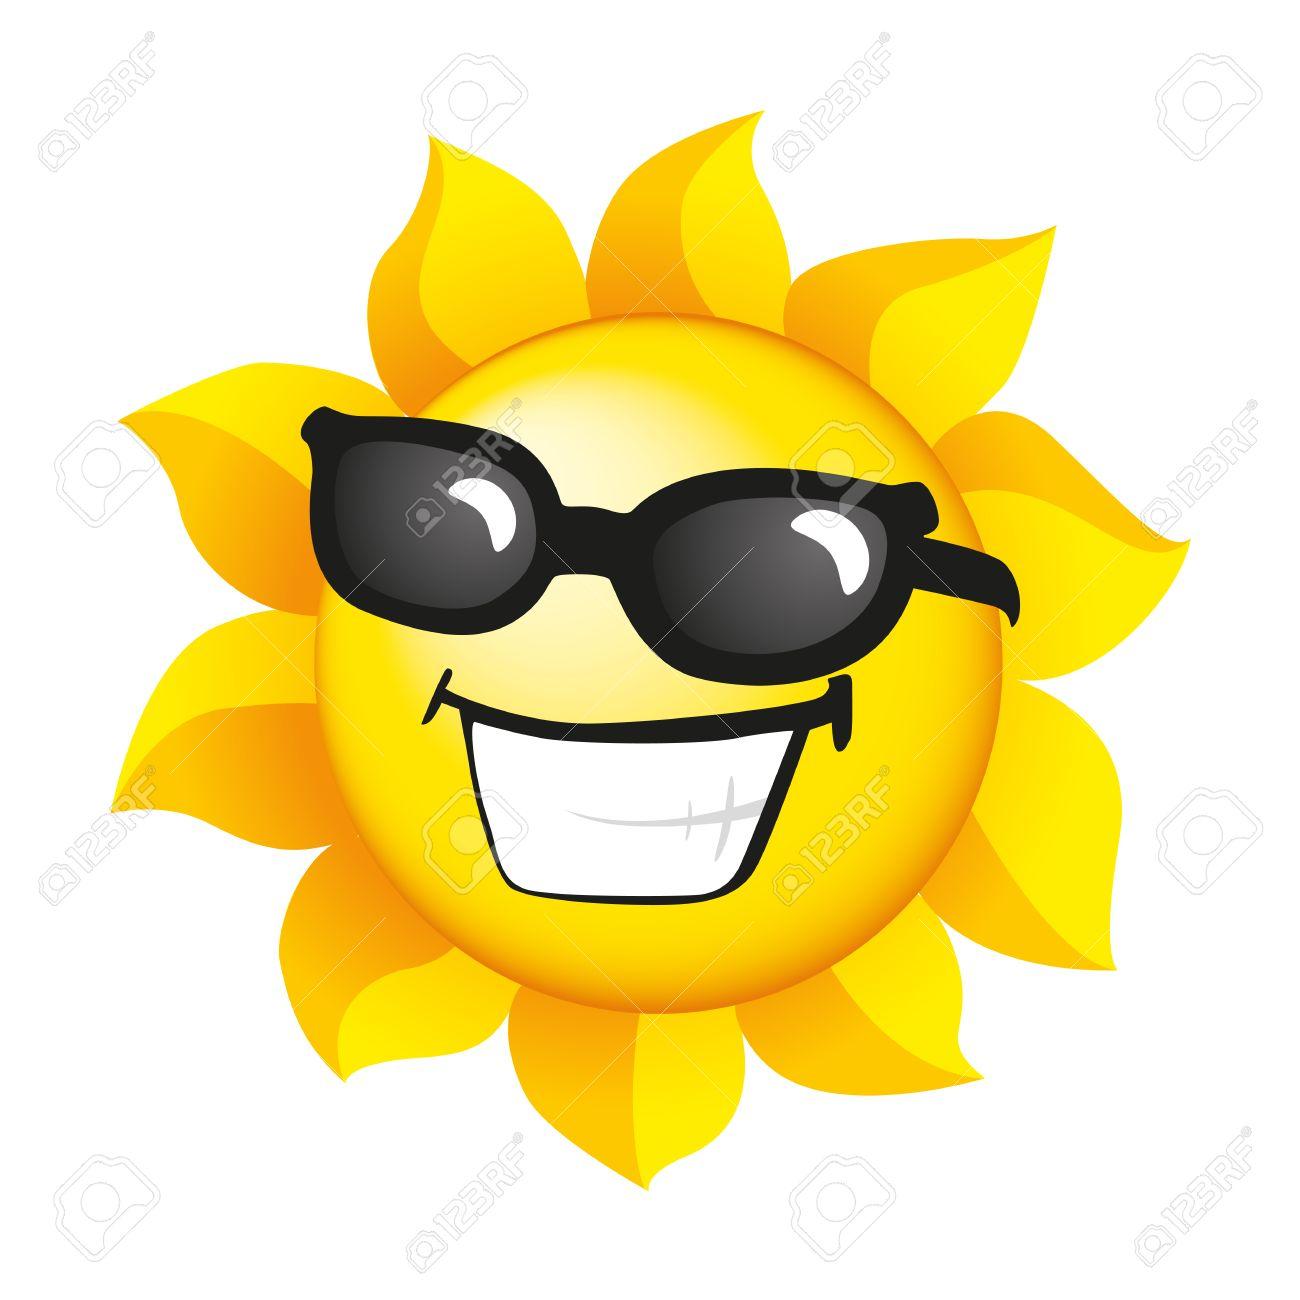 Sunshine Cartoon Royalty Free Cliparts, Vectors, And Stock ...